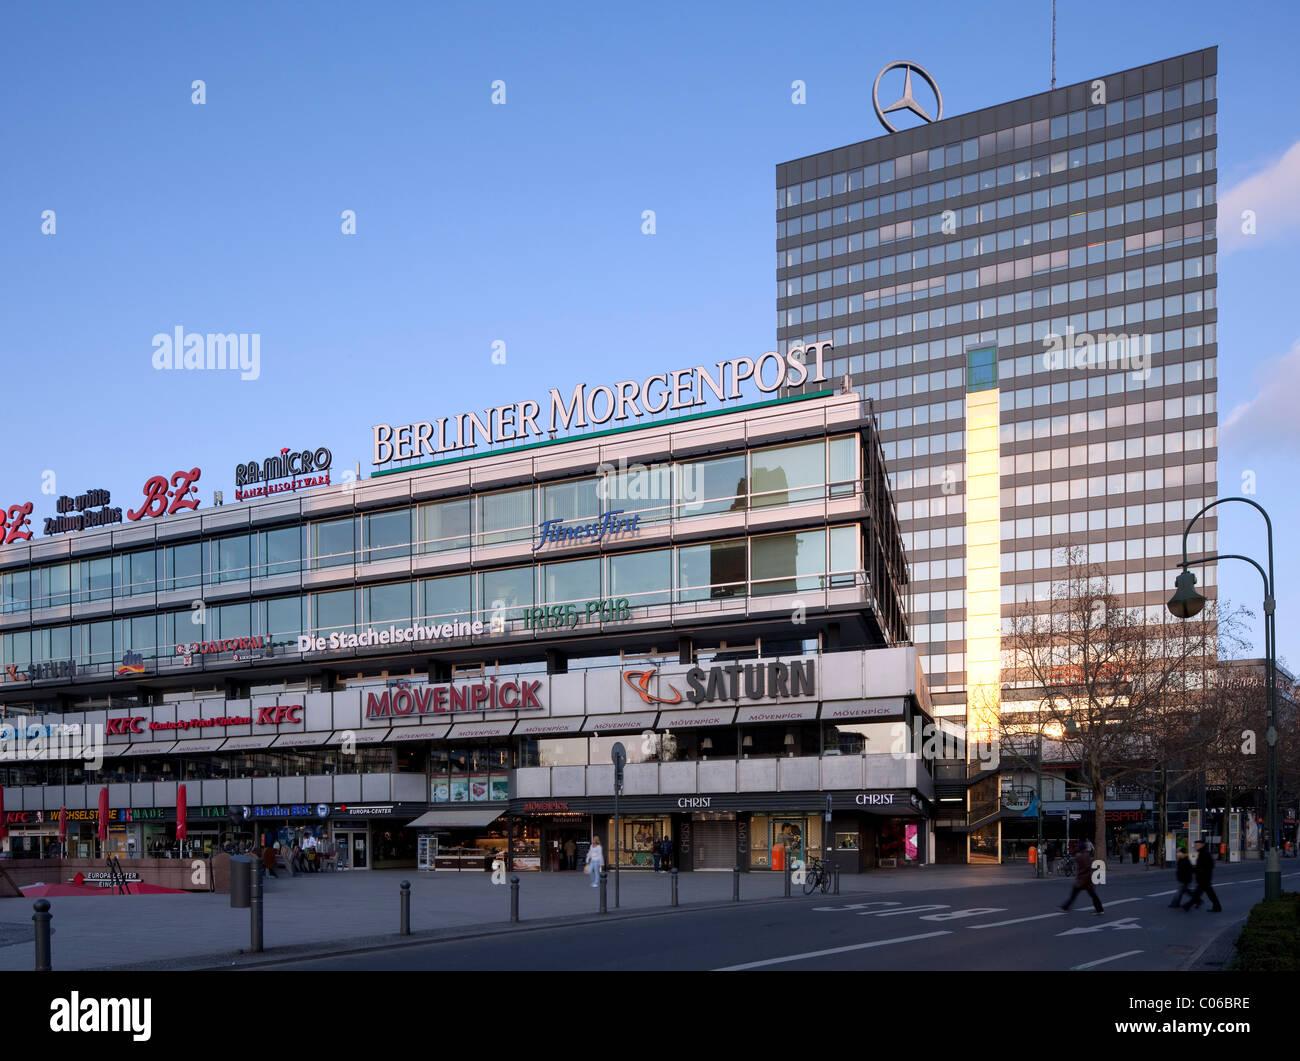 Europa Center shopping mall, Charlottenburg district, Berlin, Germany, Europe - Stock Image